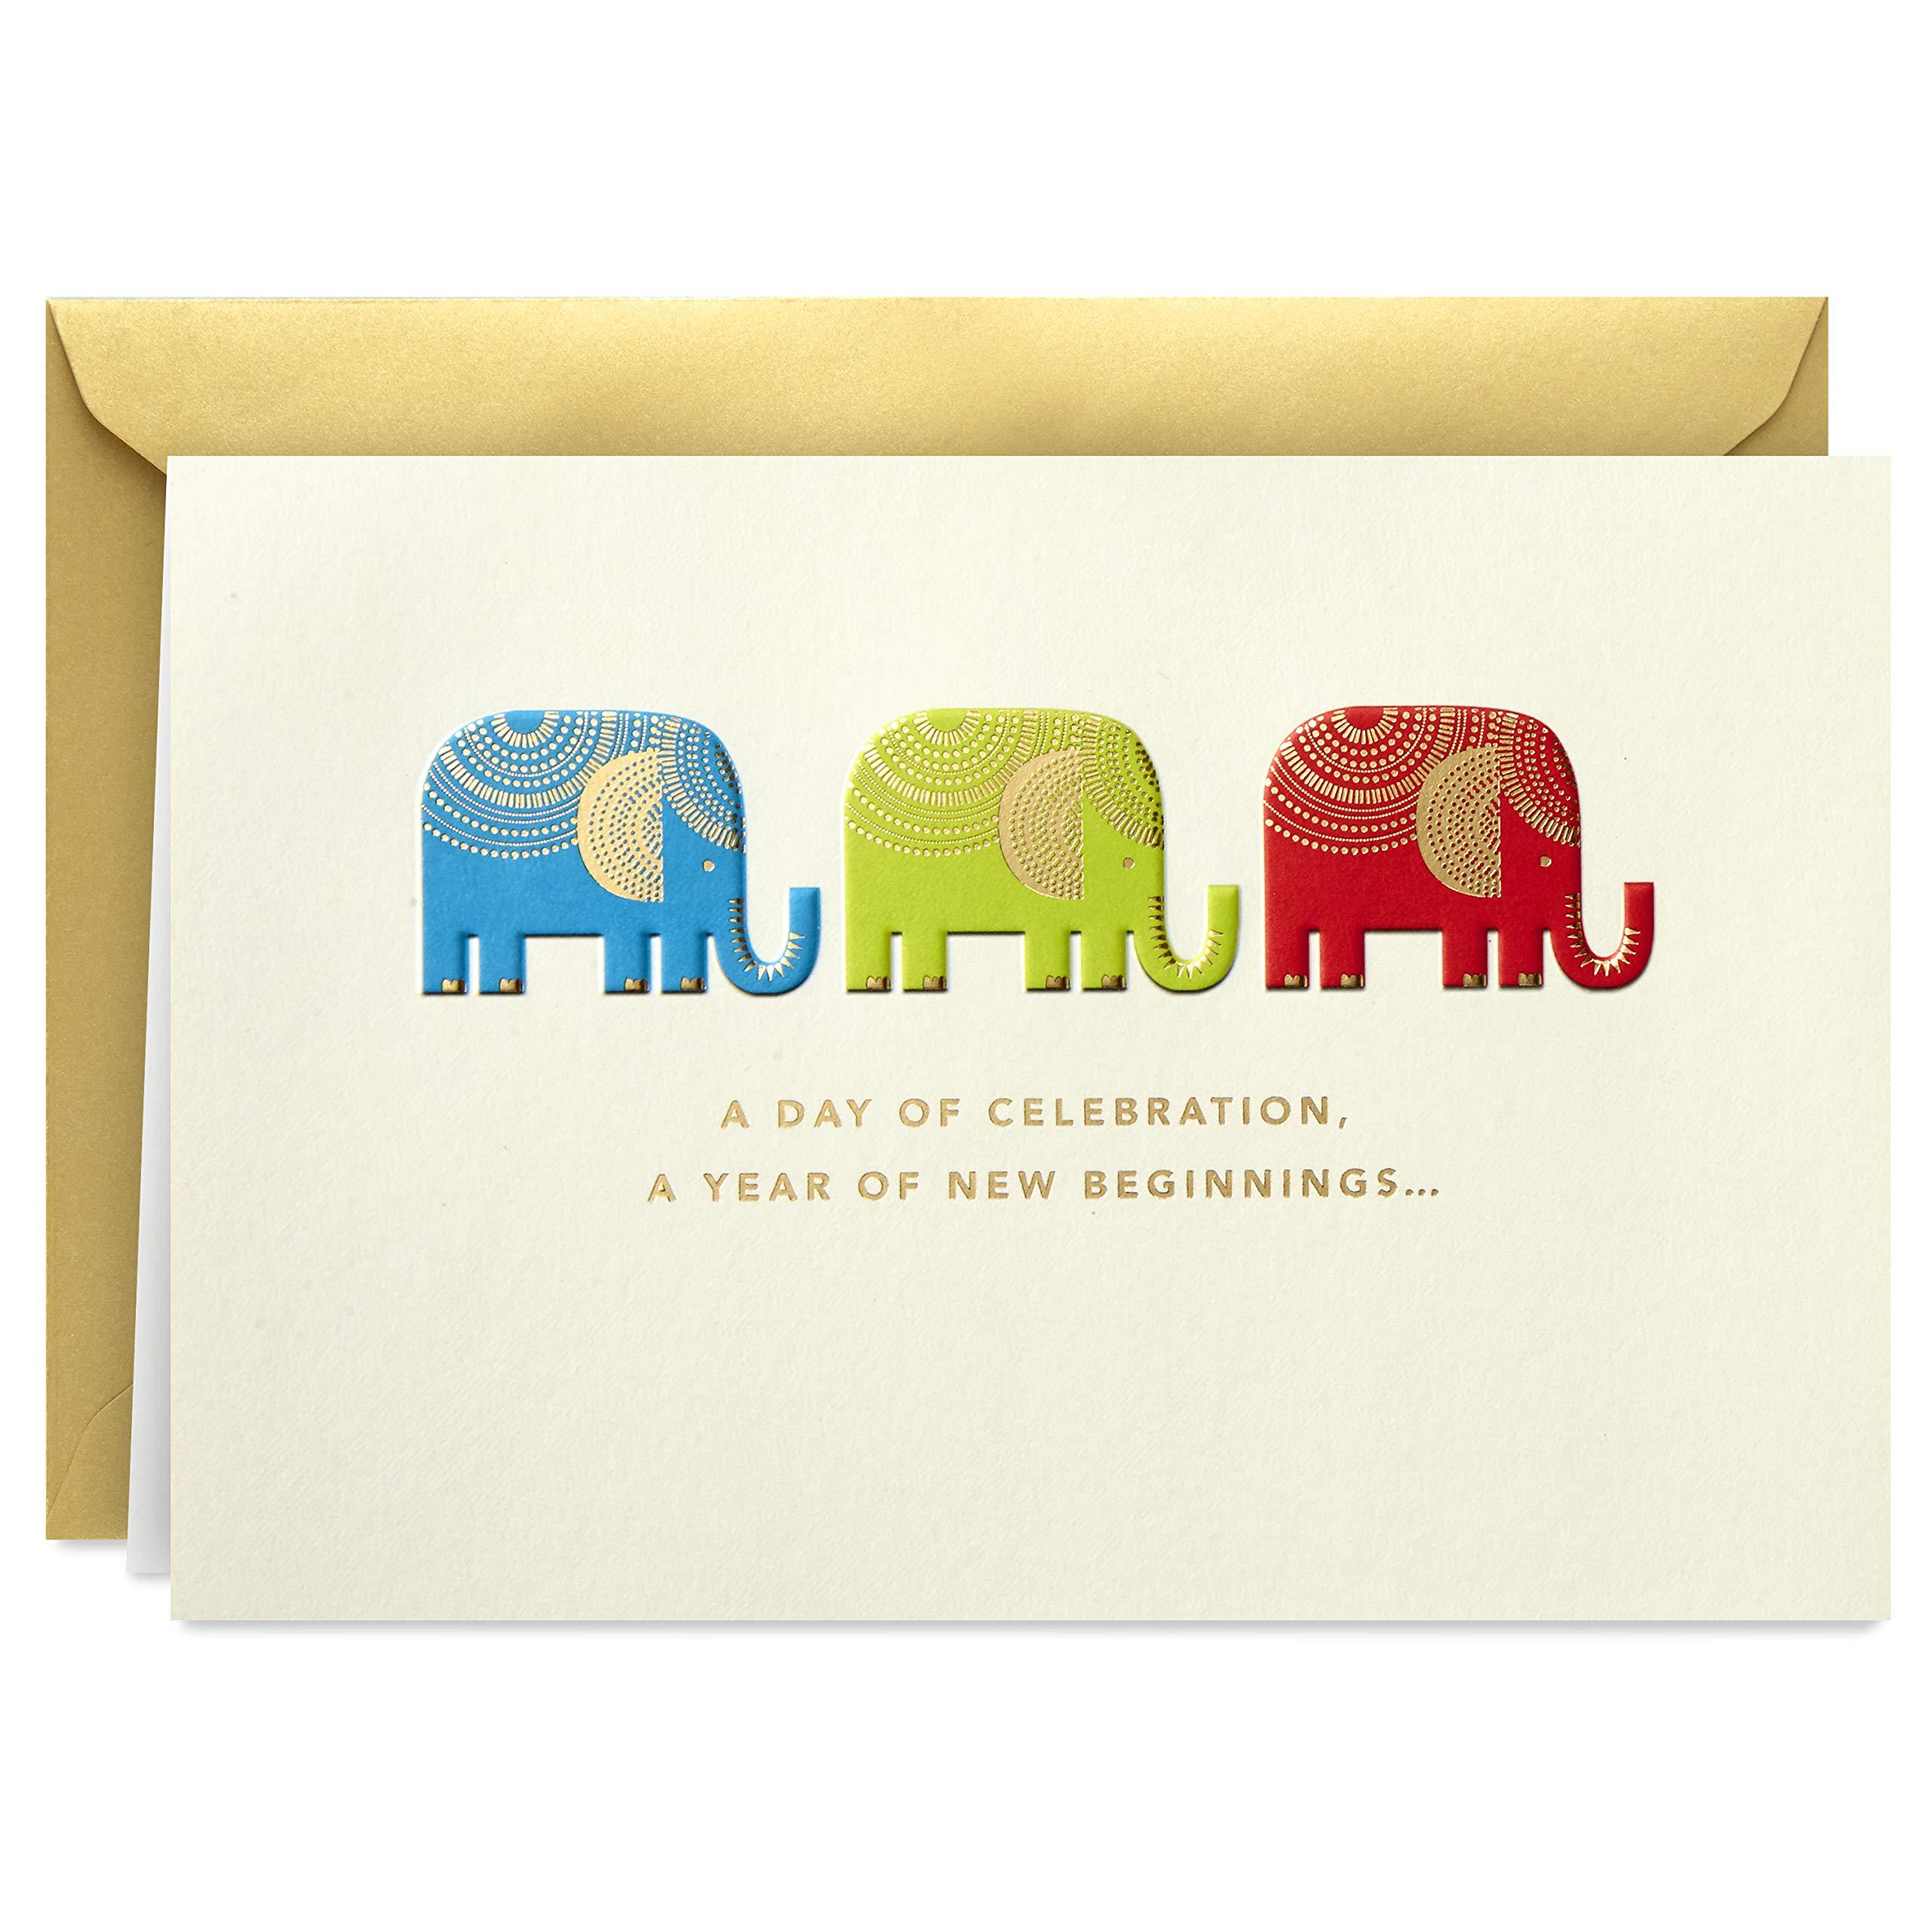 Hallmark Golden Thread Birthday Card (Elephants, Year of New Beginnings)